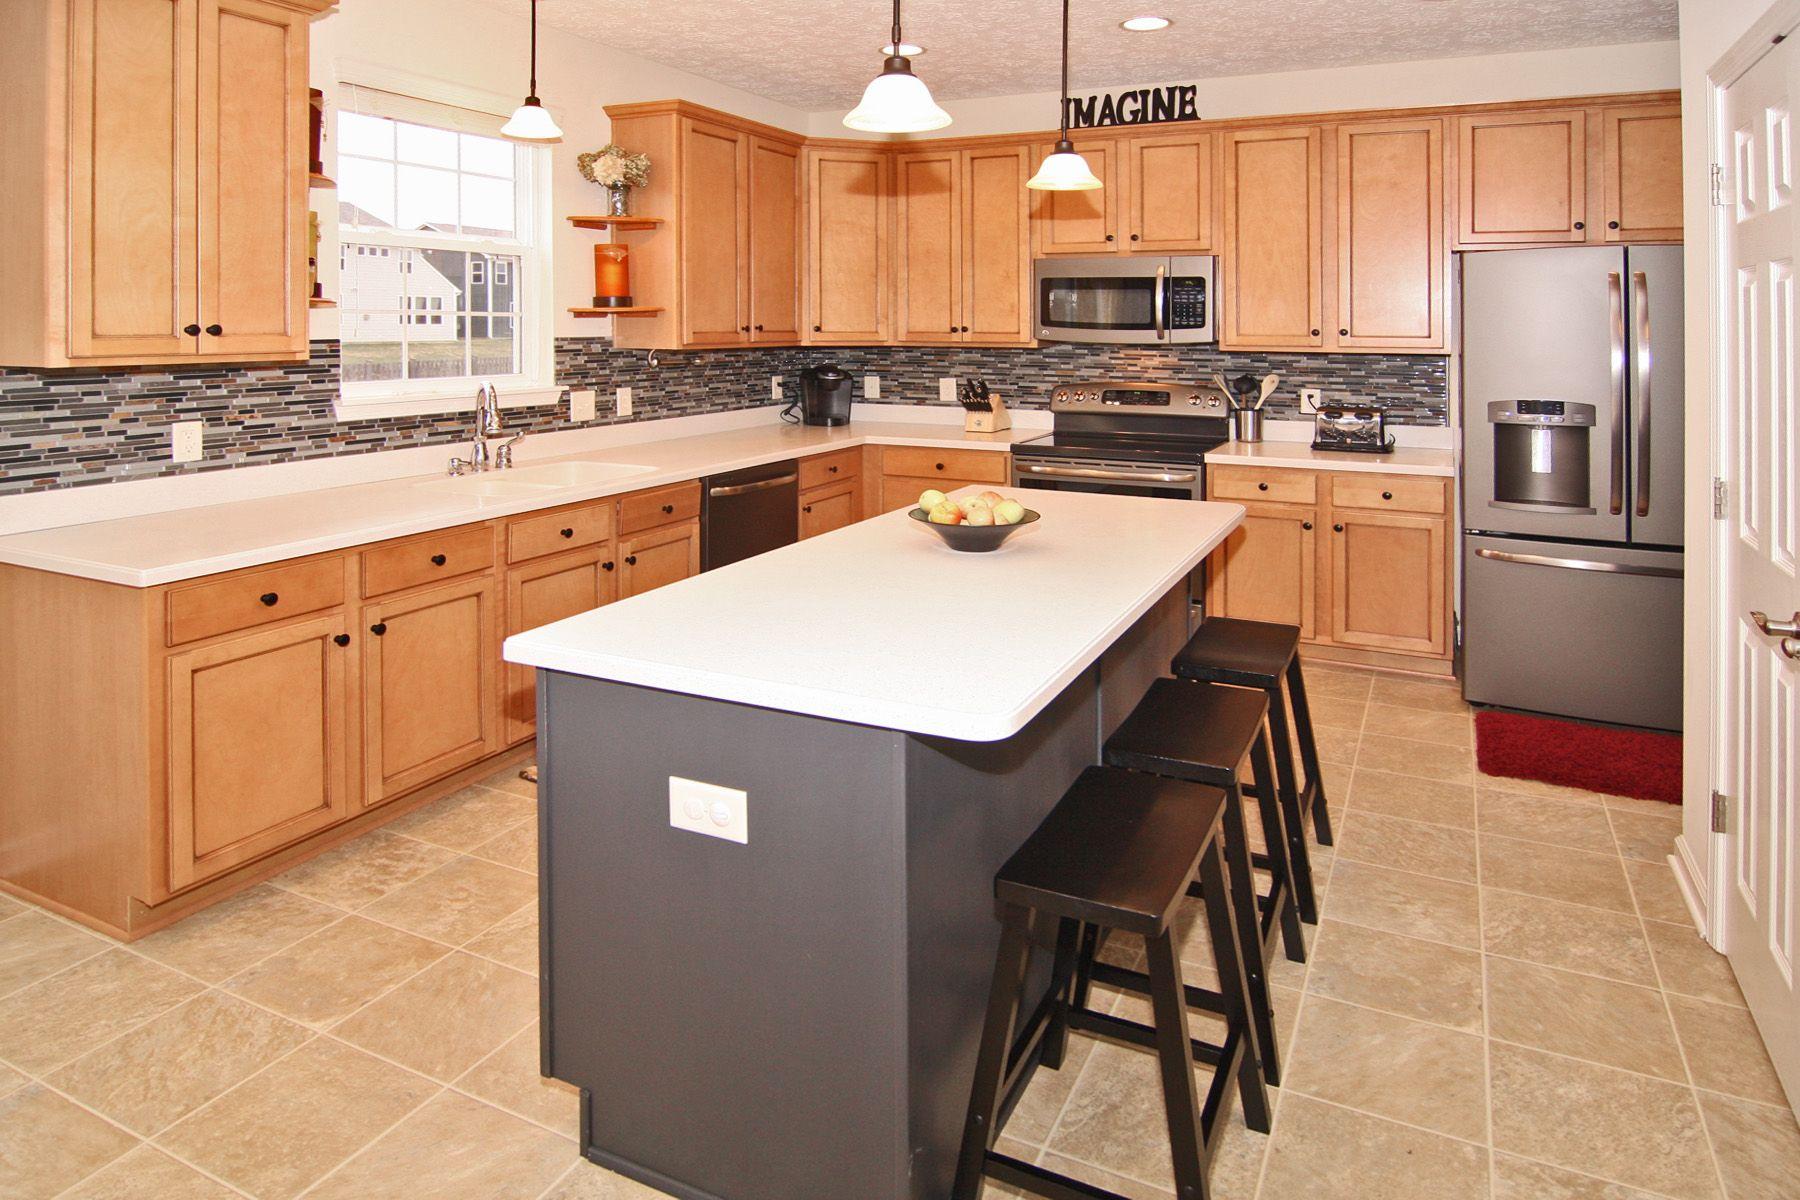 Kitchens With Slate Appliances Amazing Kitchengreat New Slate Appliances 9723 Brooks Drive